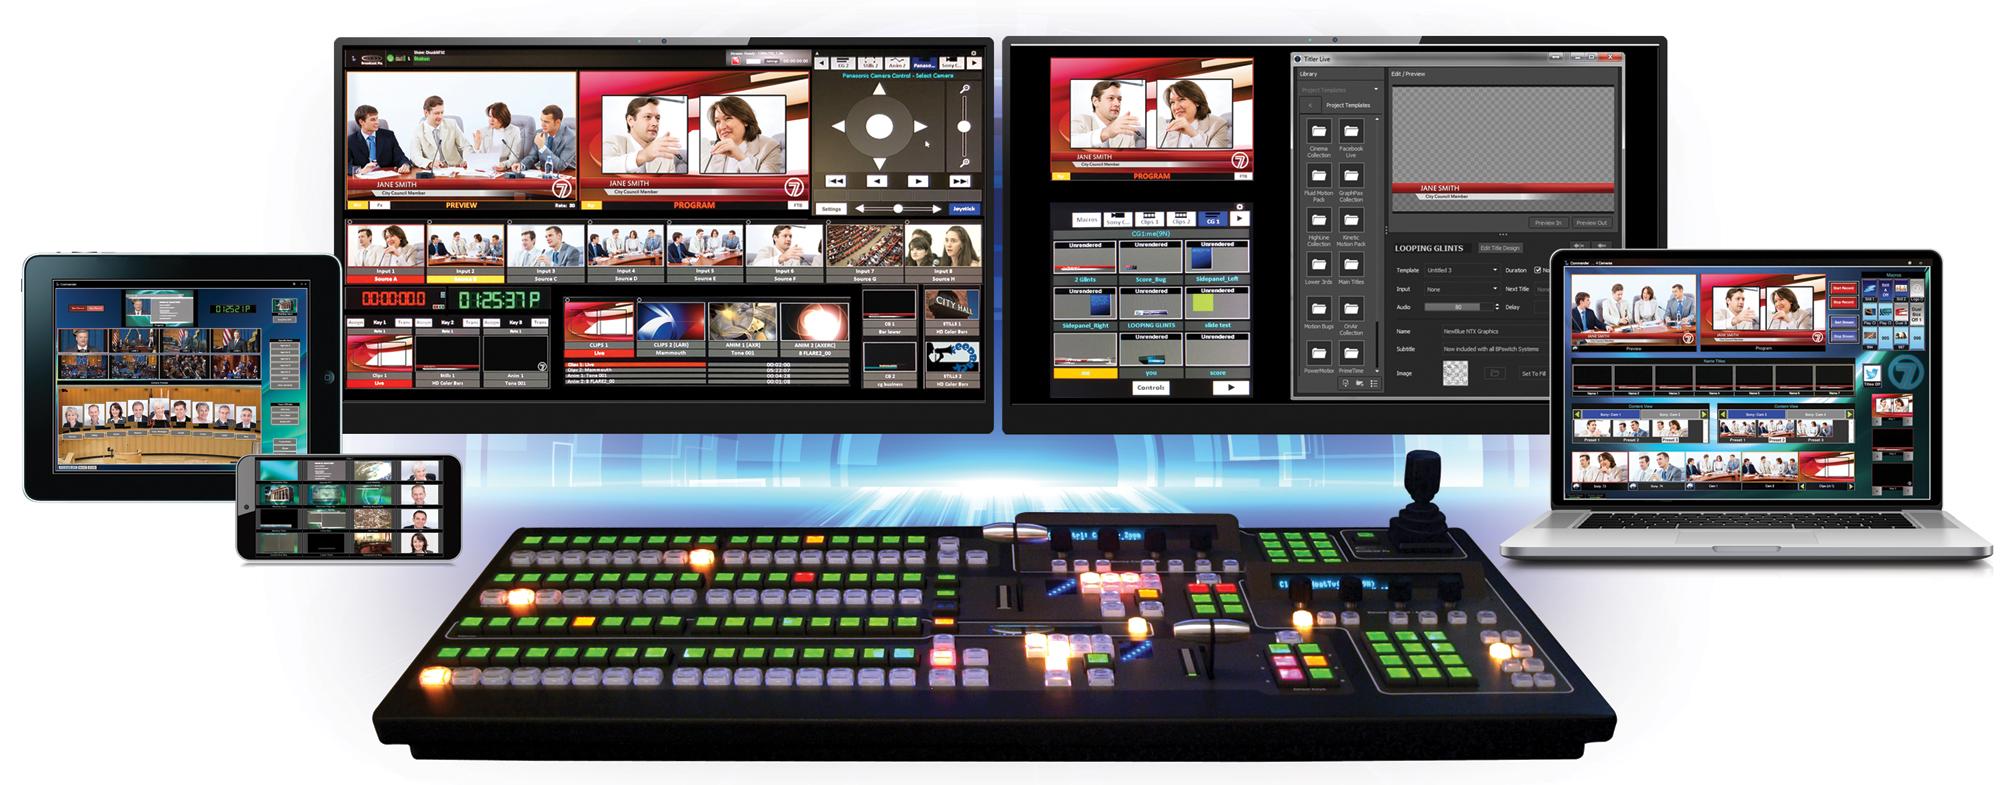 Broadcast Pix Control Surfaces | Broadcast Pix, Inc  [US]